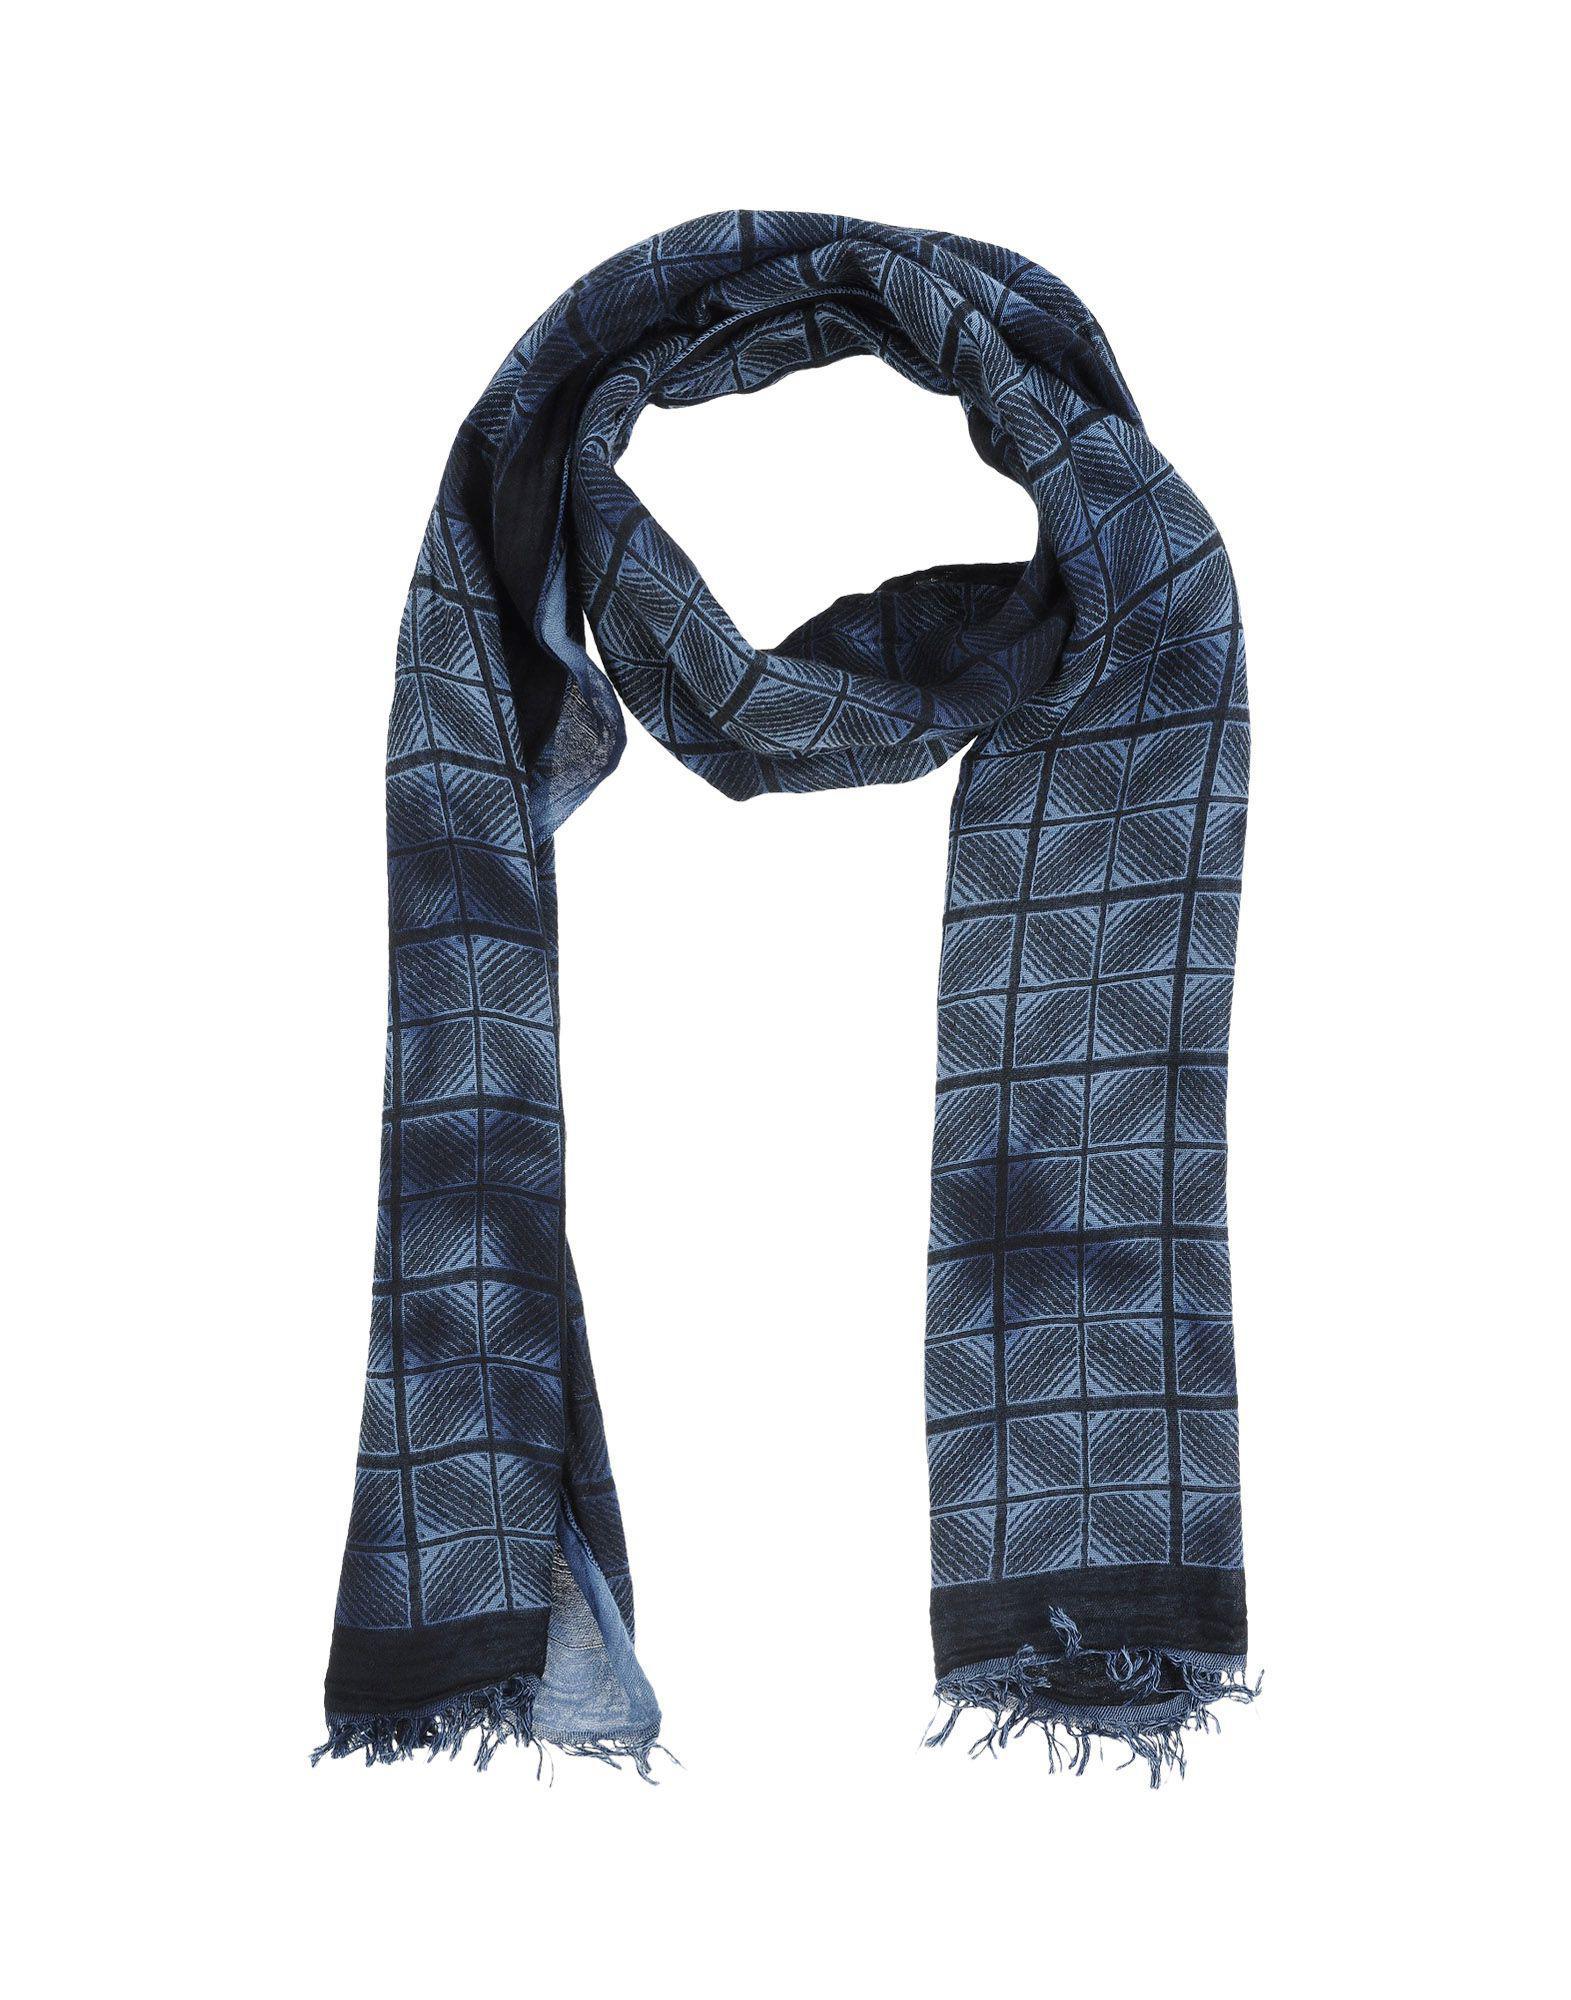 ACCESSORIES - Oblong scarves Denham dlWkmyVf